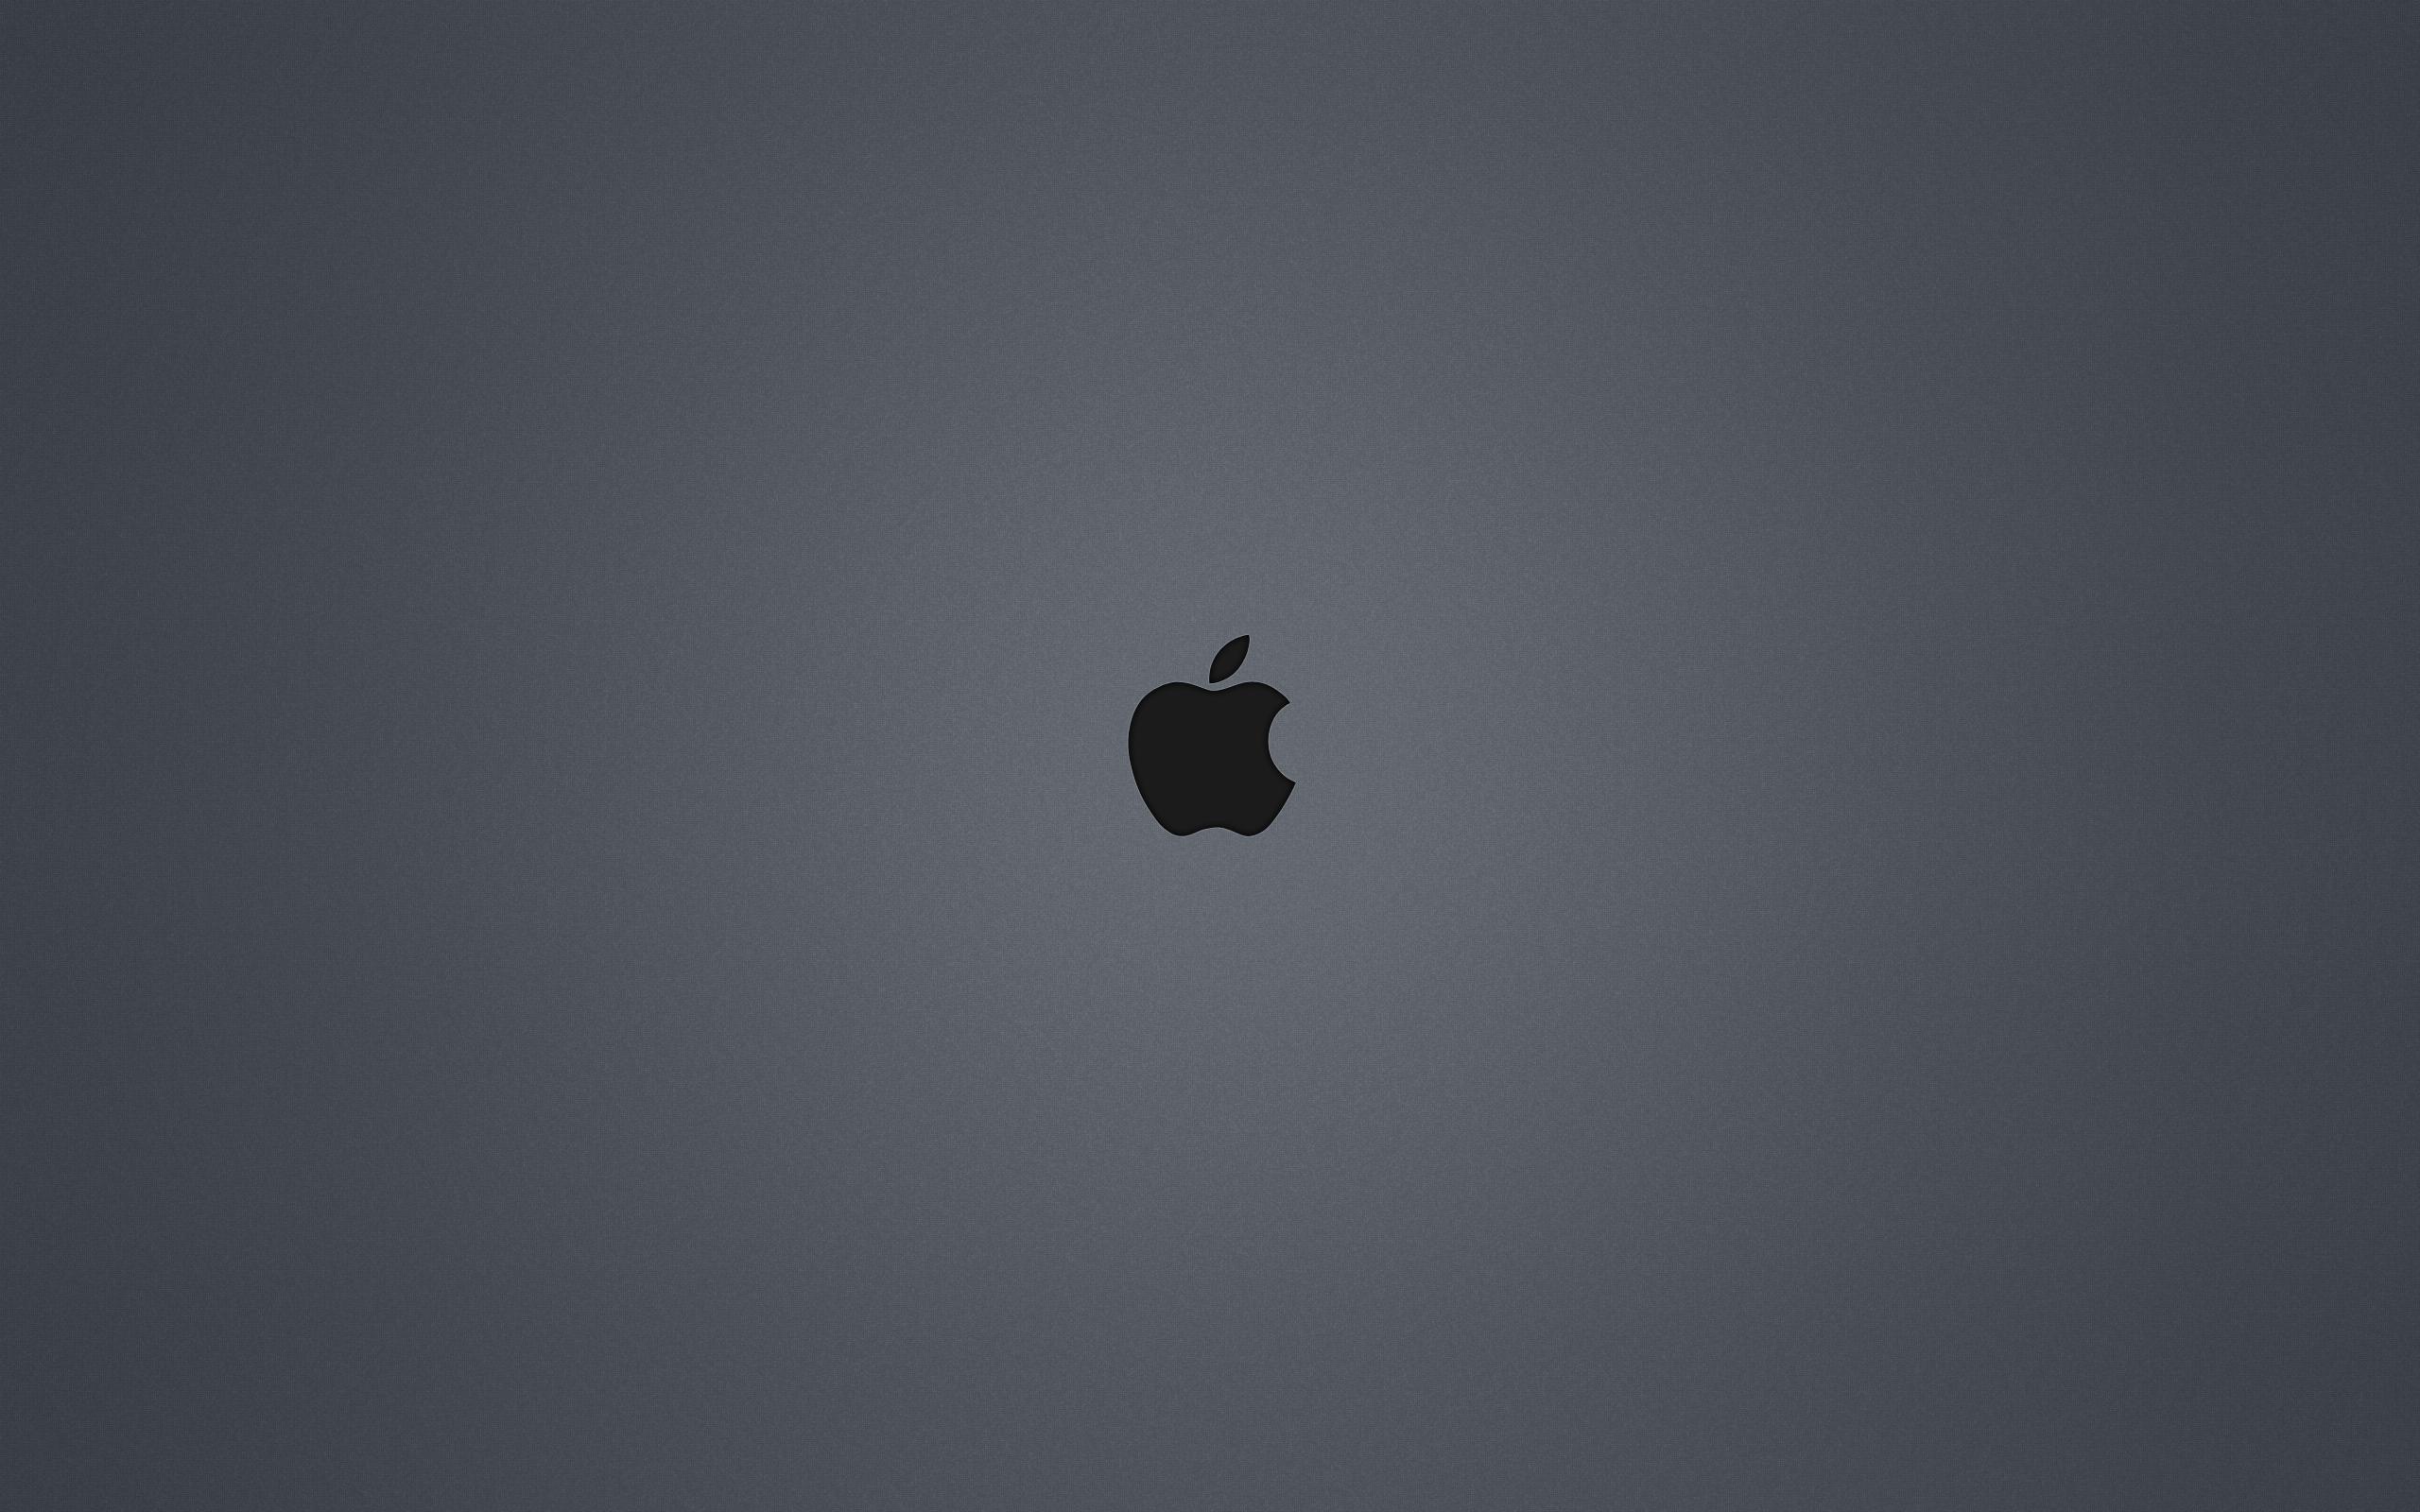 Apple pro wallpapers Apple pro stock photos 2560x1600